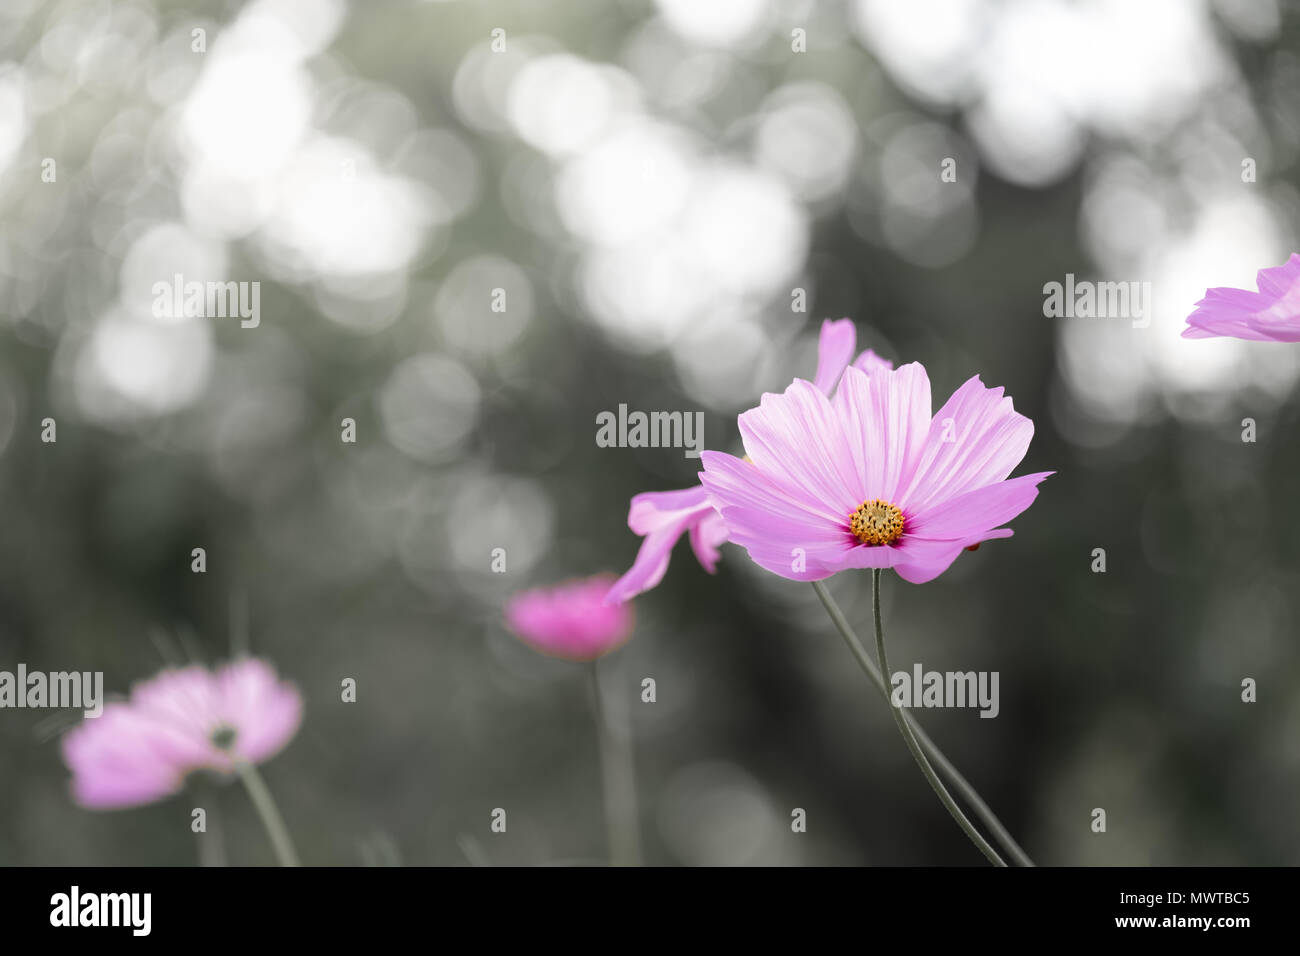 Black and white blackground-field of blooming  pink sulphureus flower in the garden, Thailand. Stock Photo